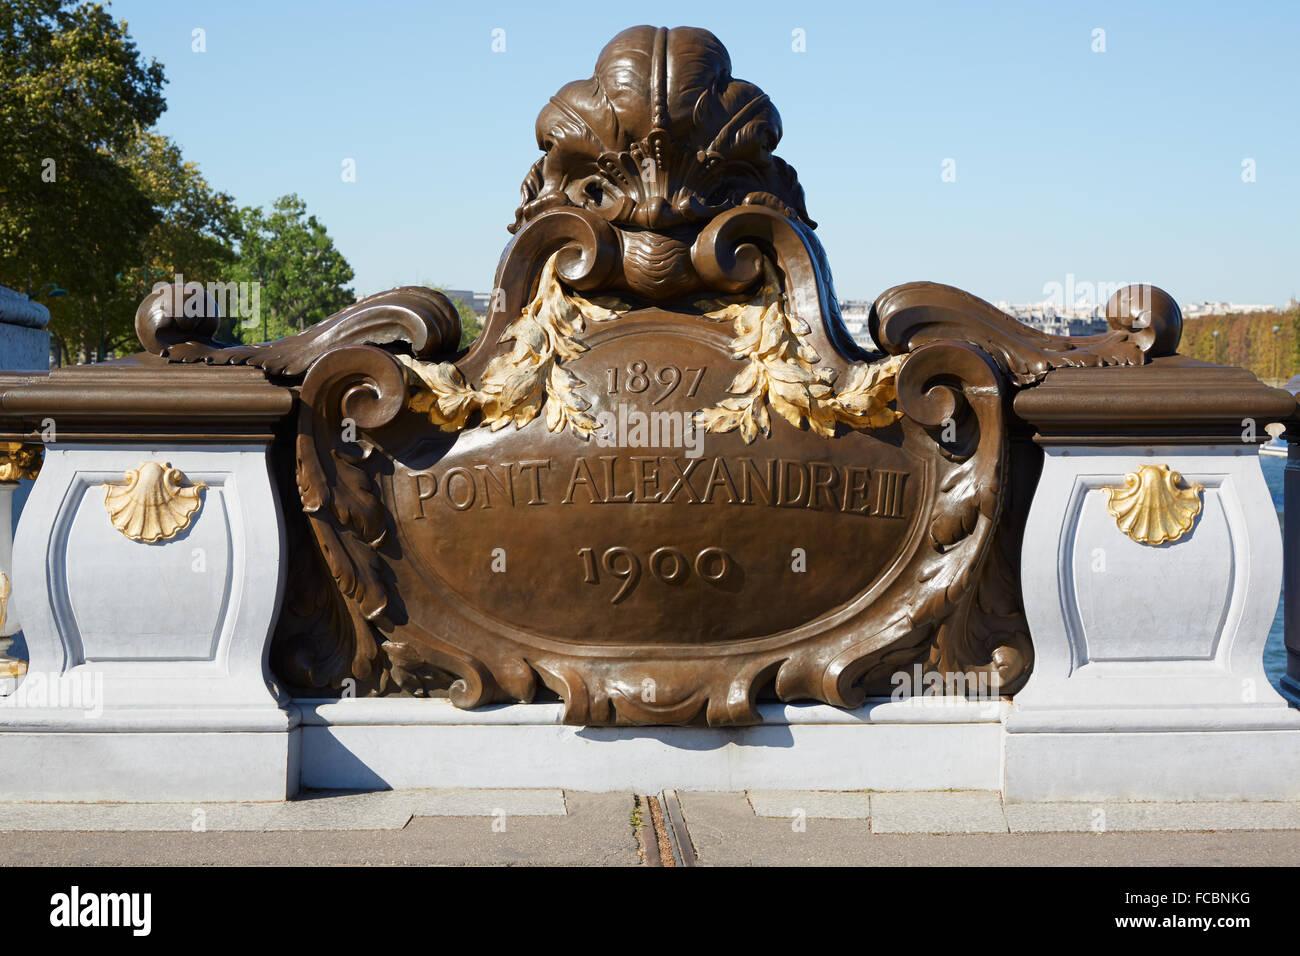 Pont Alexandre III Brücke Balustrade Emblem in Paris, am frühen Morgen Stockbild